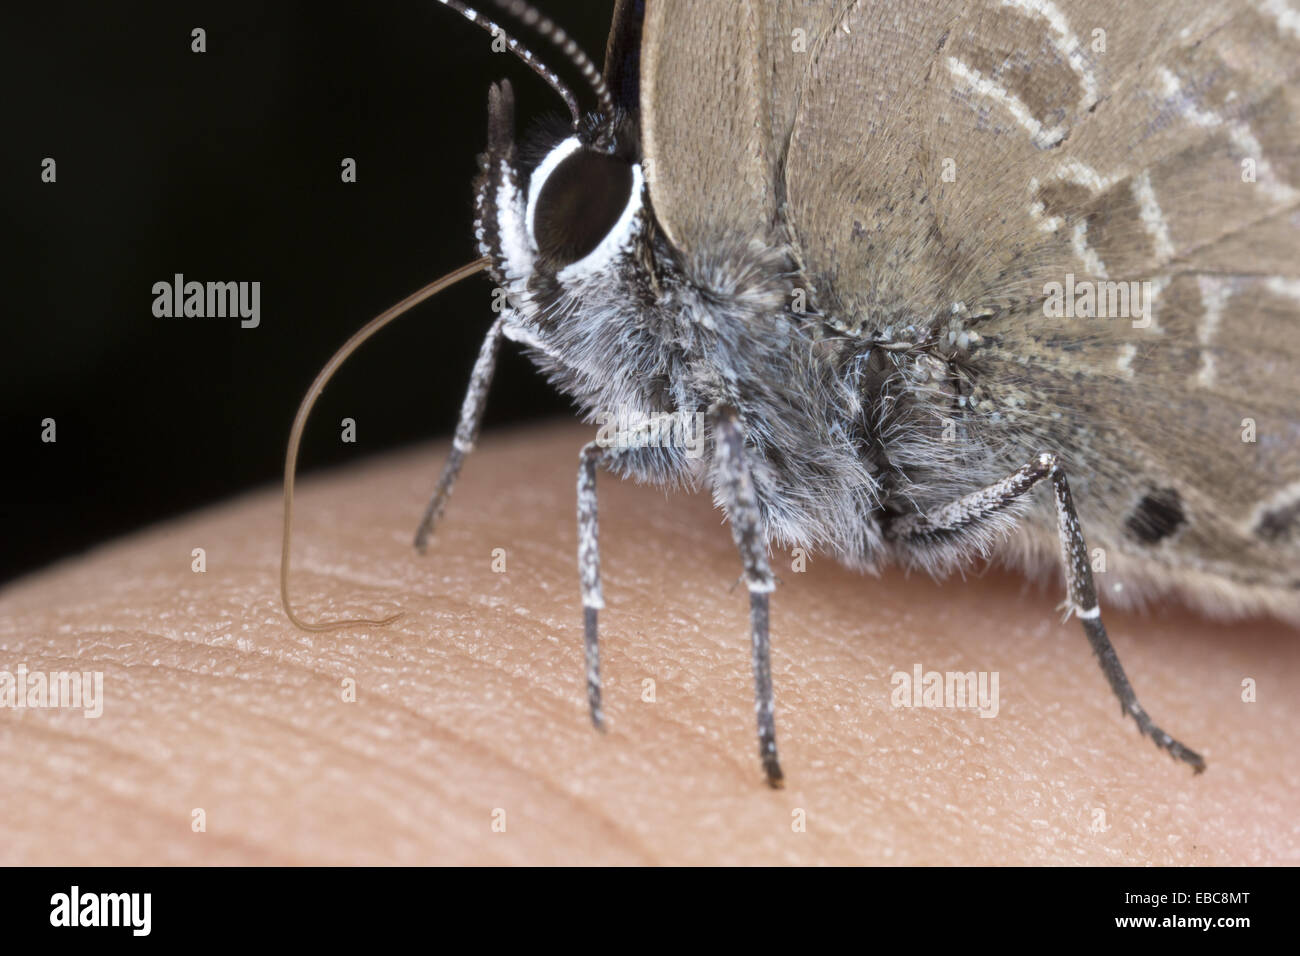 Butterfly sucking on sweat from hand. Image taken at Kampung Skudup, Sarawak, Malaysia. - Stock Image